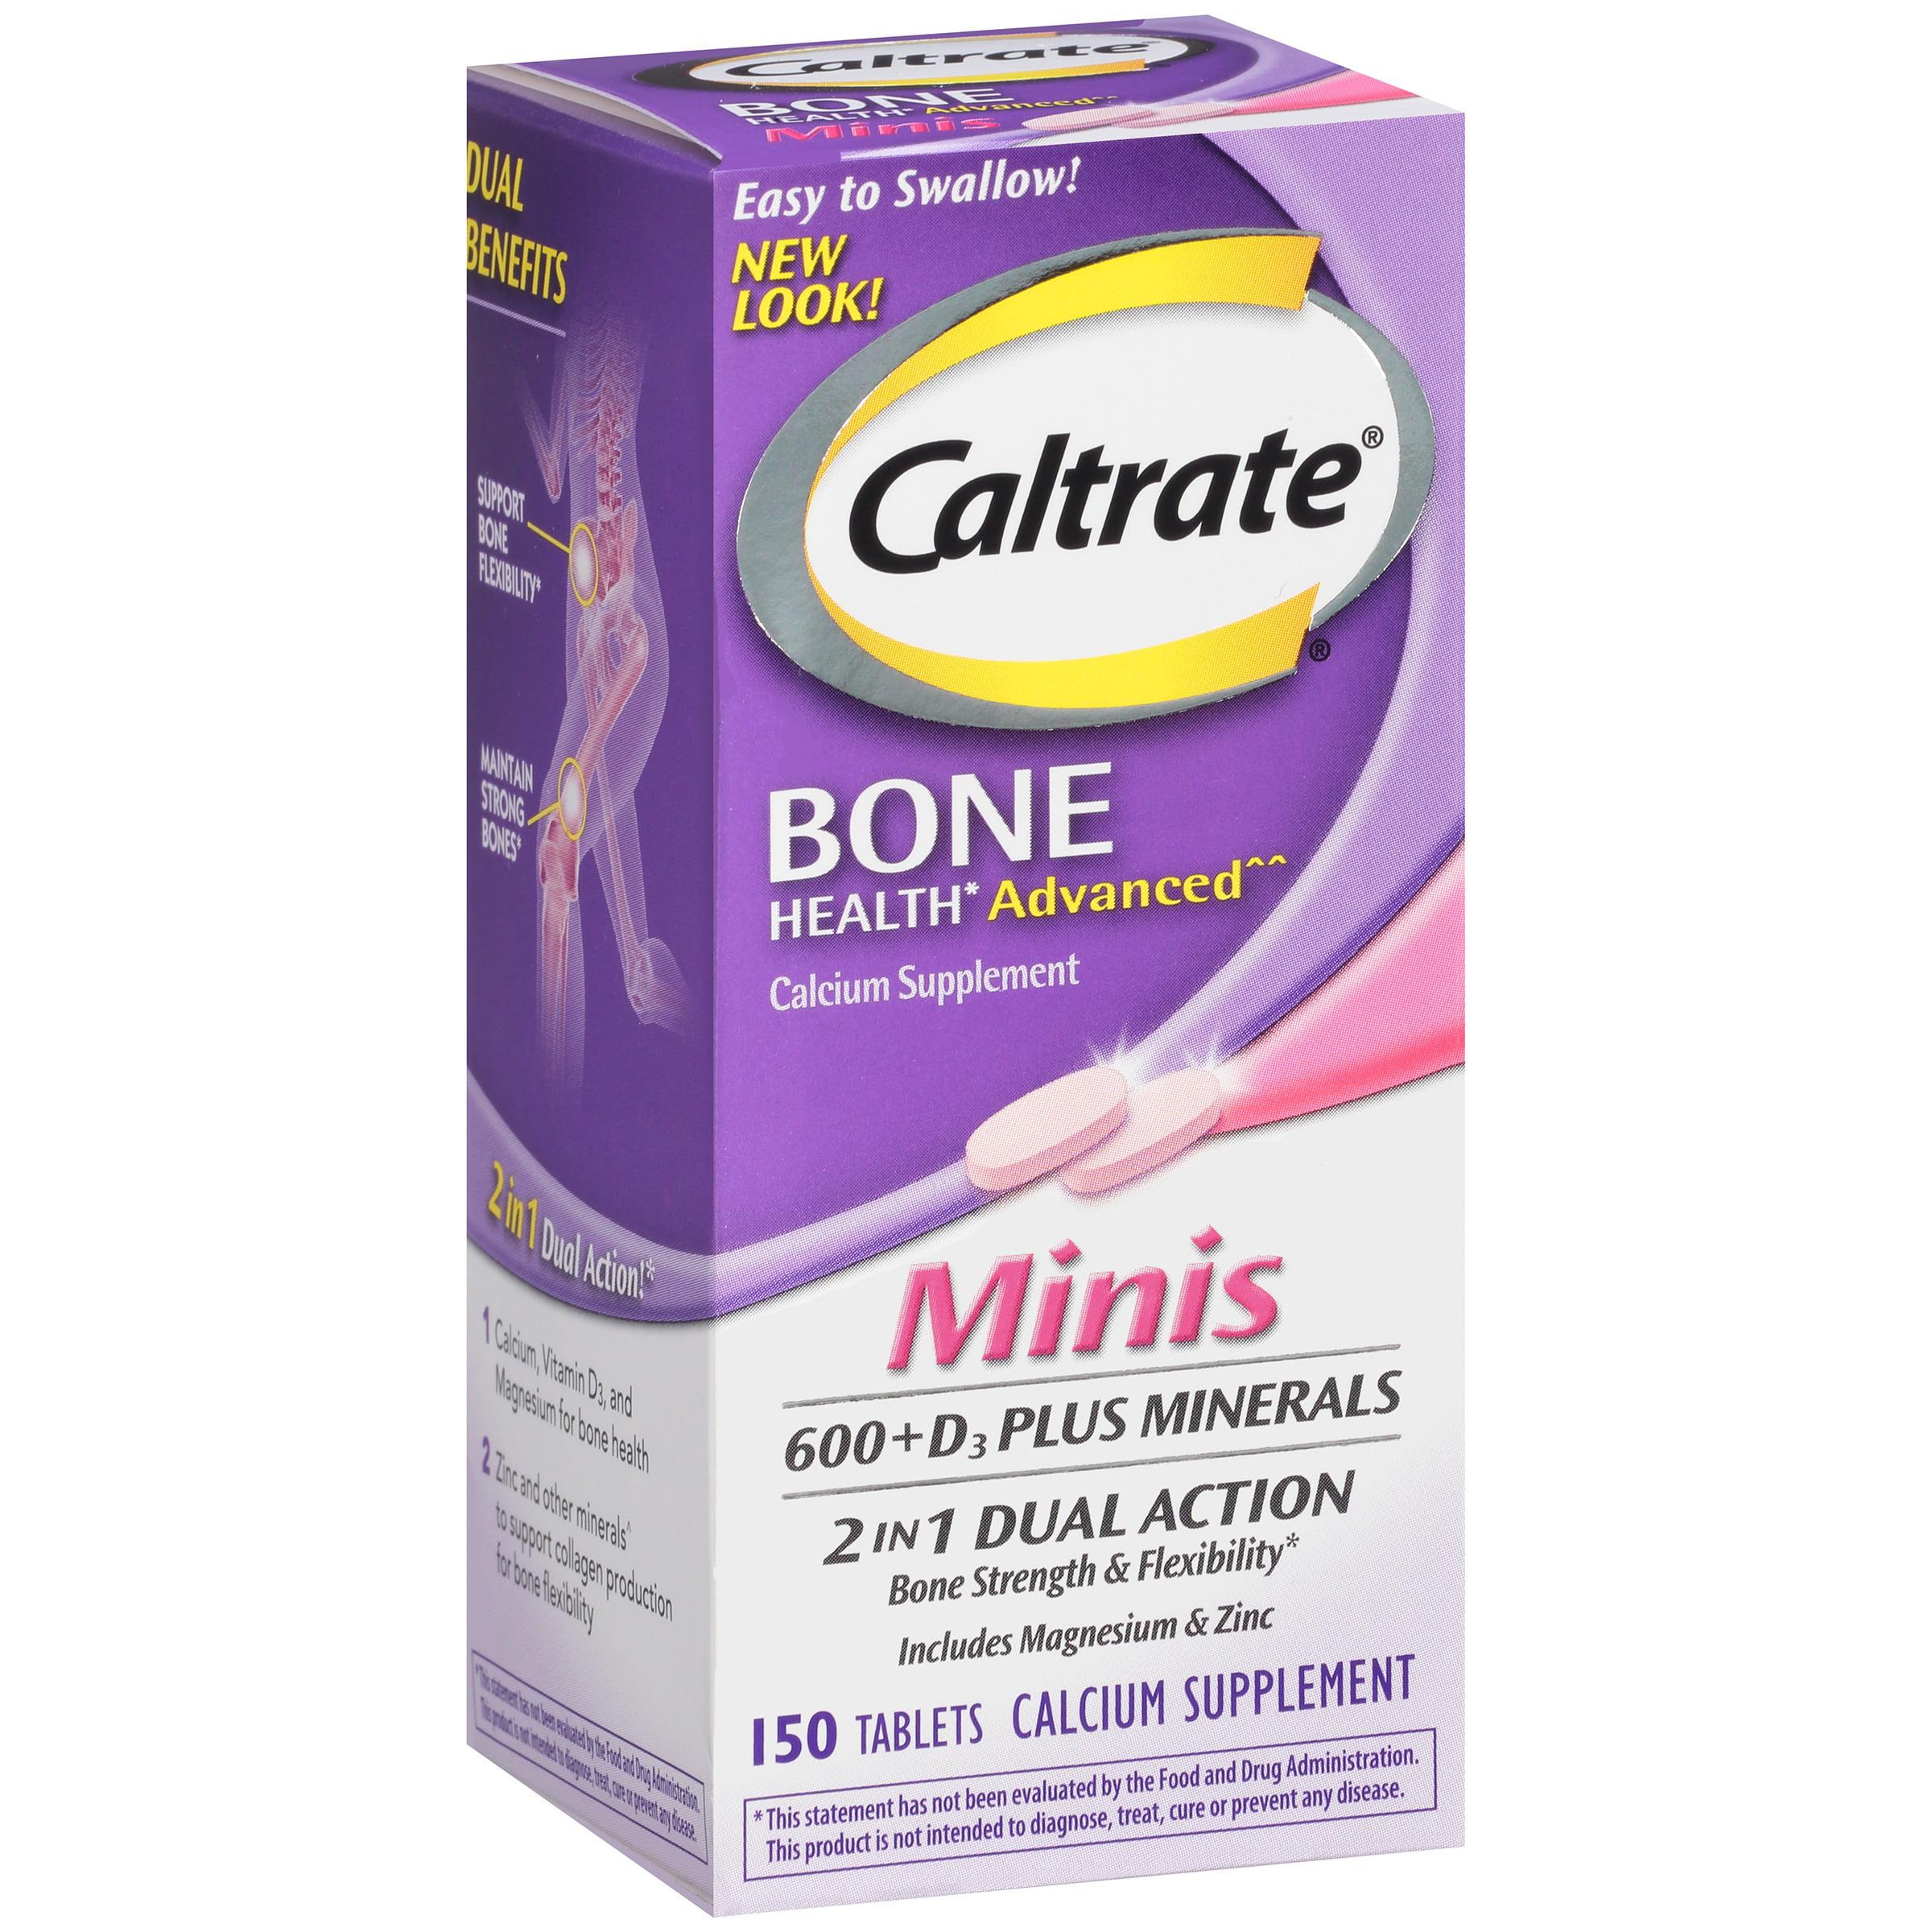 Caltrate Bone Health Advanced 600+D3 plus Minerals Calcium Mini Tablets, 150 Ct